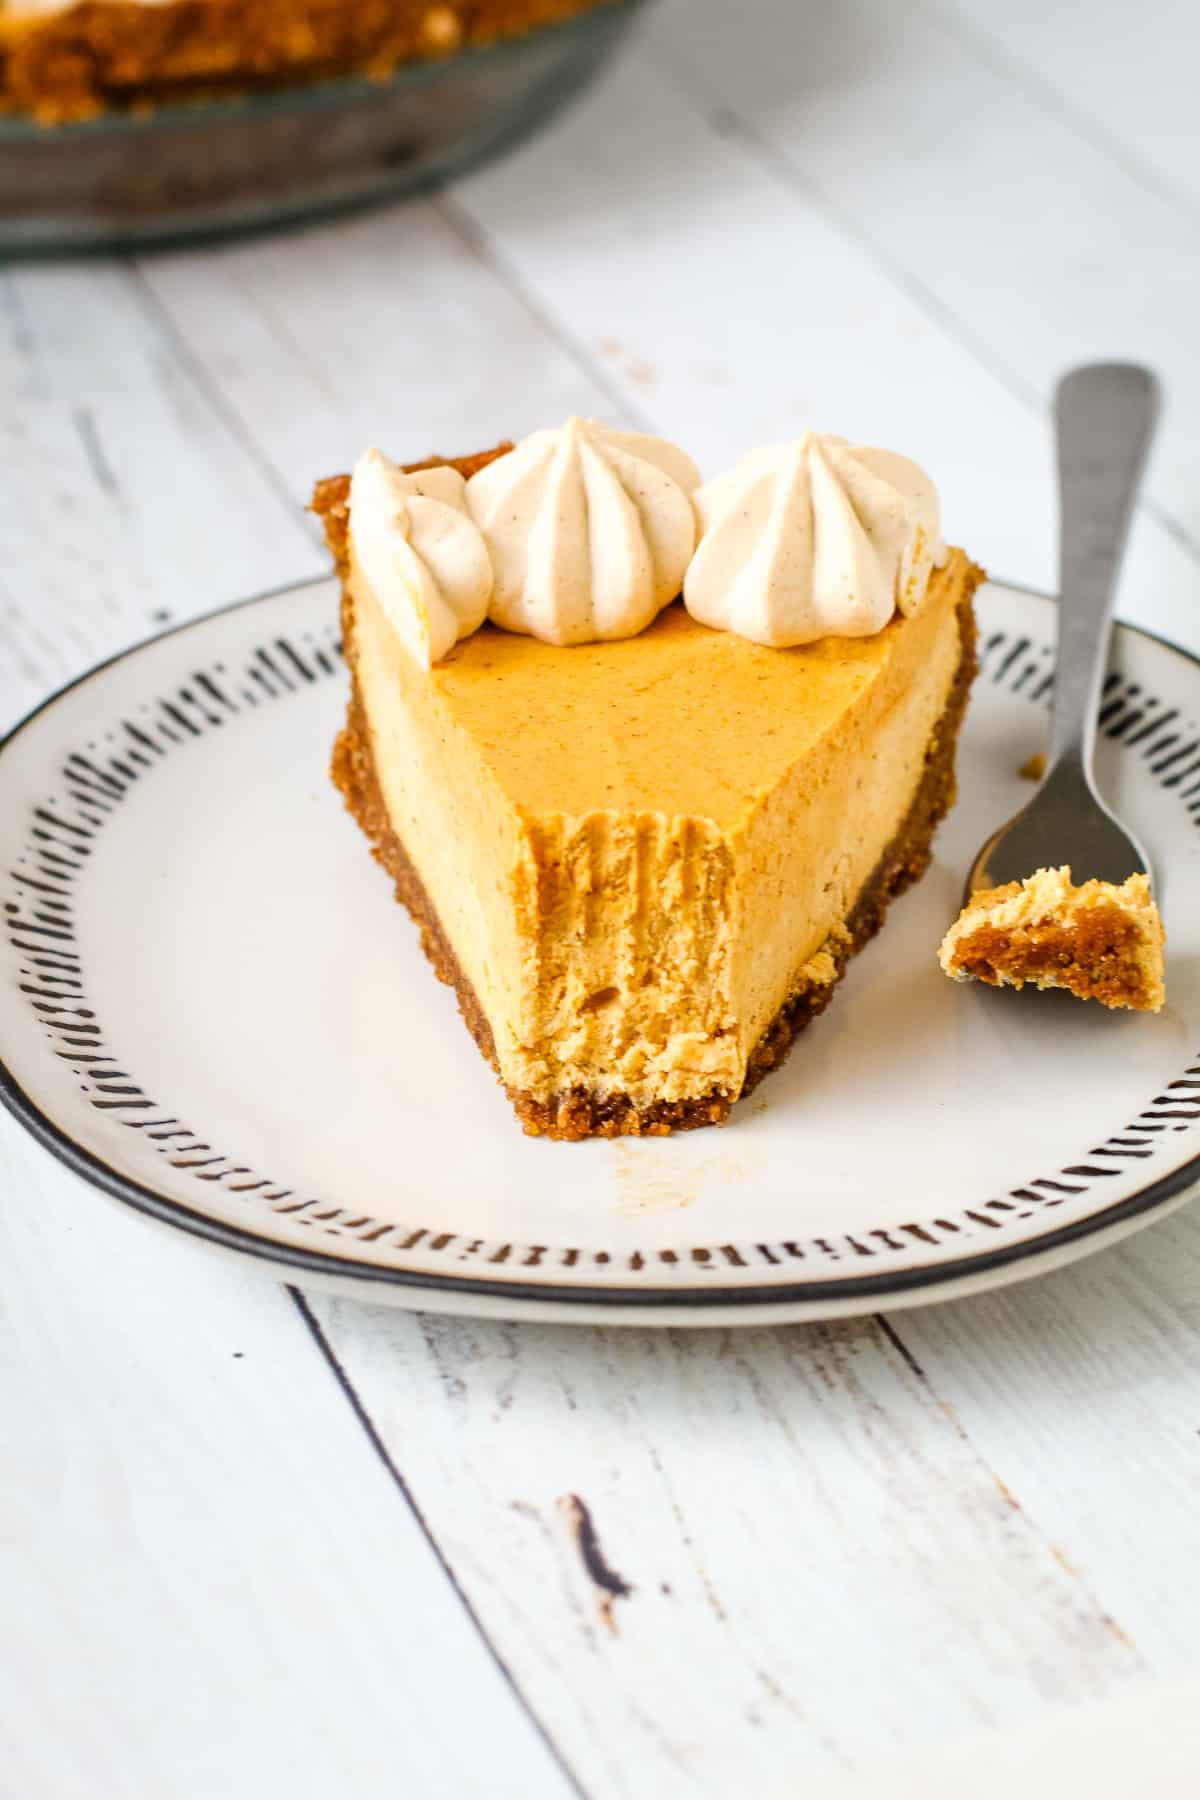 Creamy pumpkin pie recipe sliced up